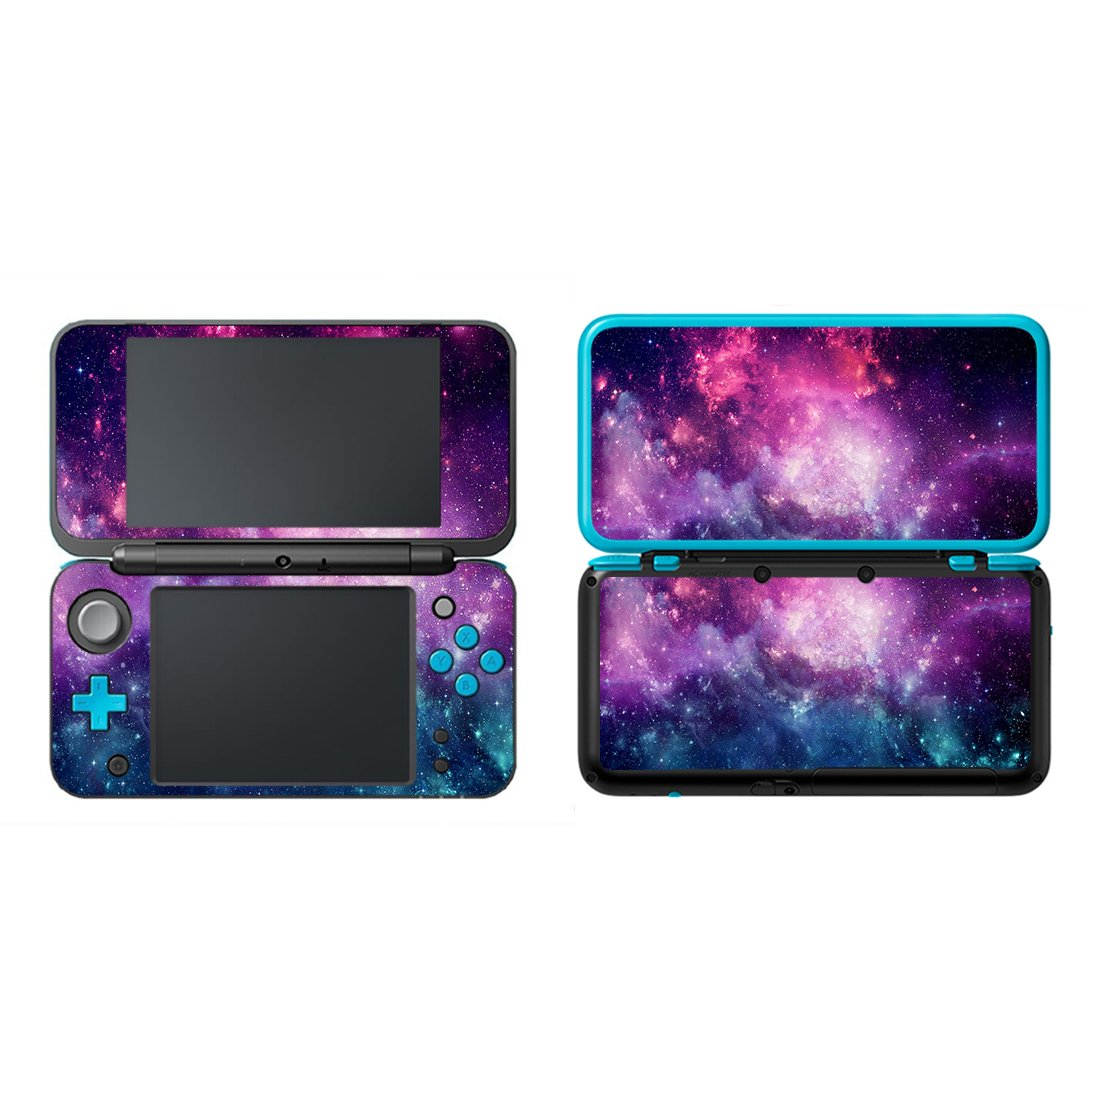 eSeeking Vinyl Cover Decals Skin Sticker for New Nintendo 2DS XL / LL - Aubergine Cosmic